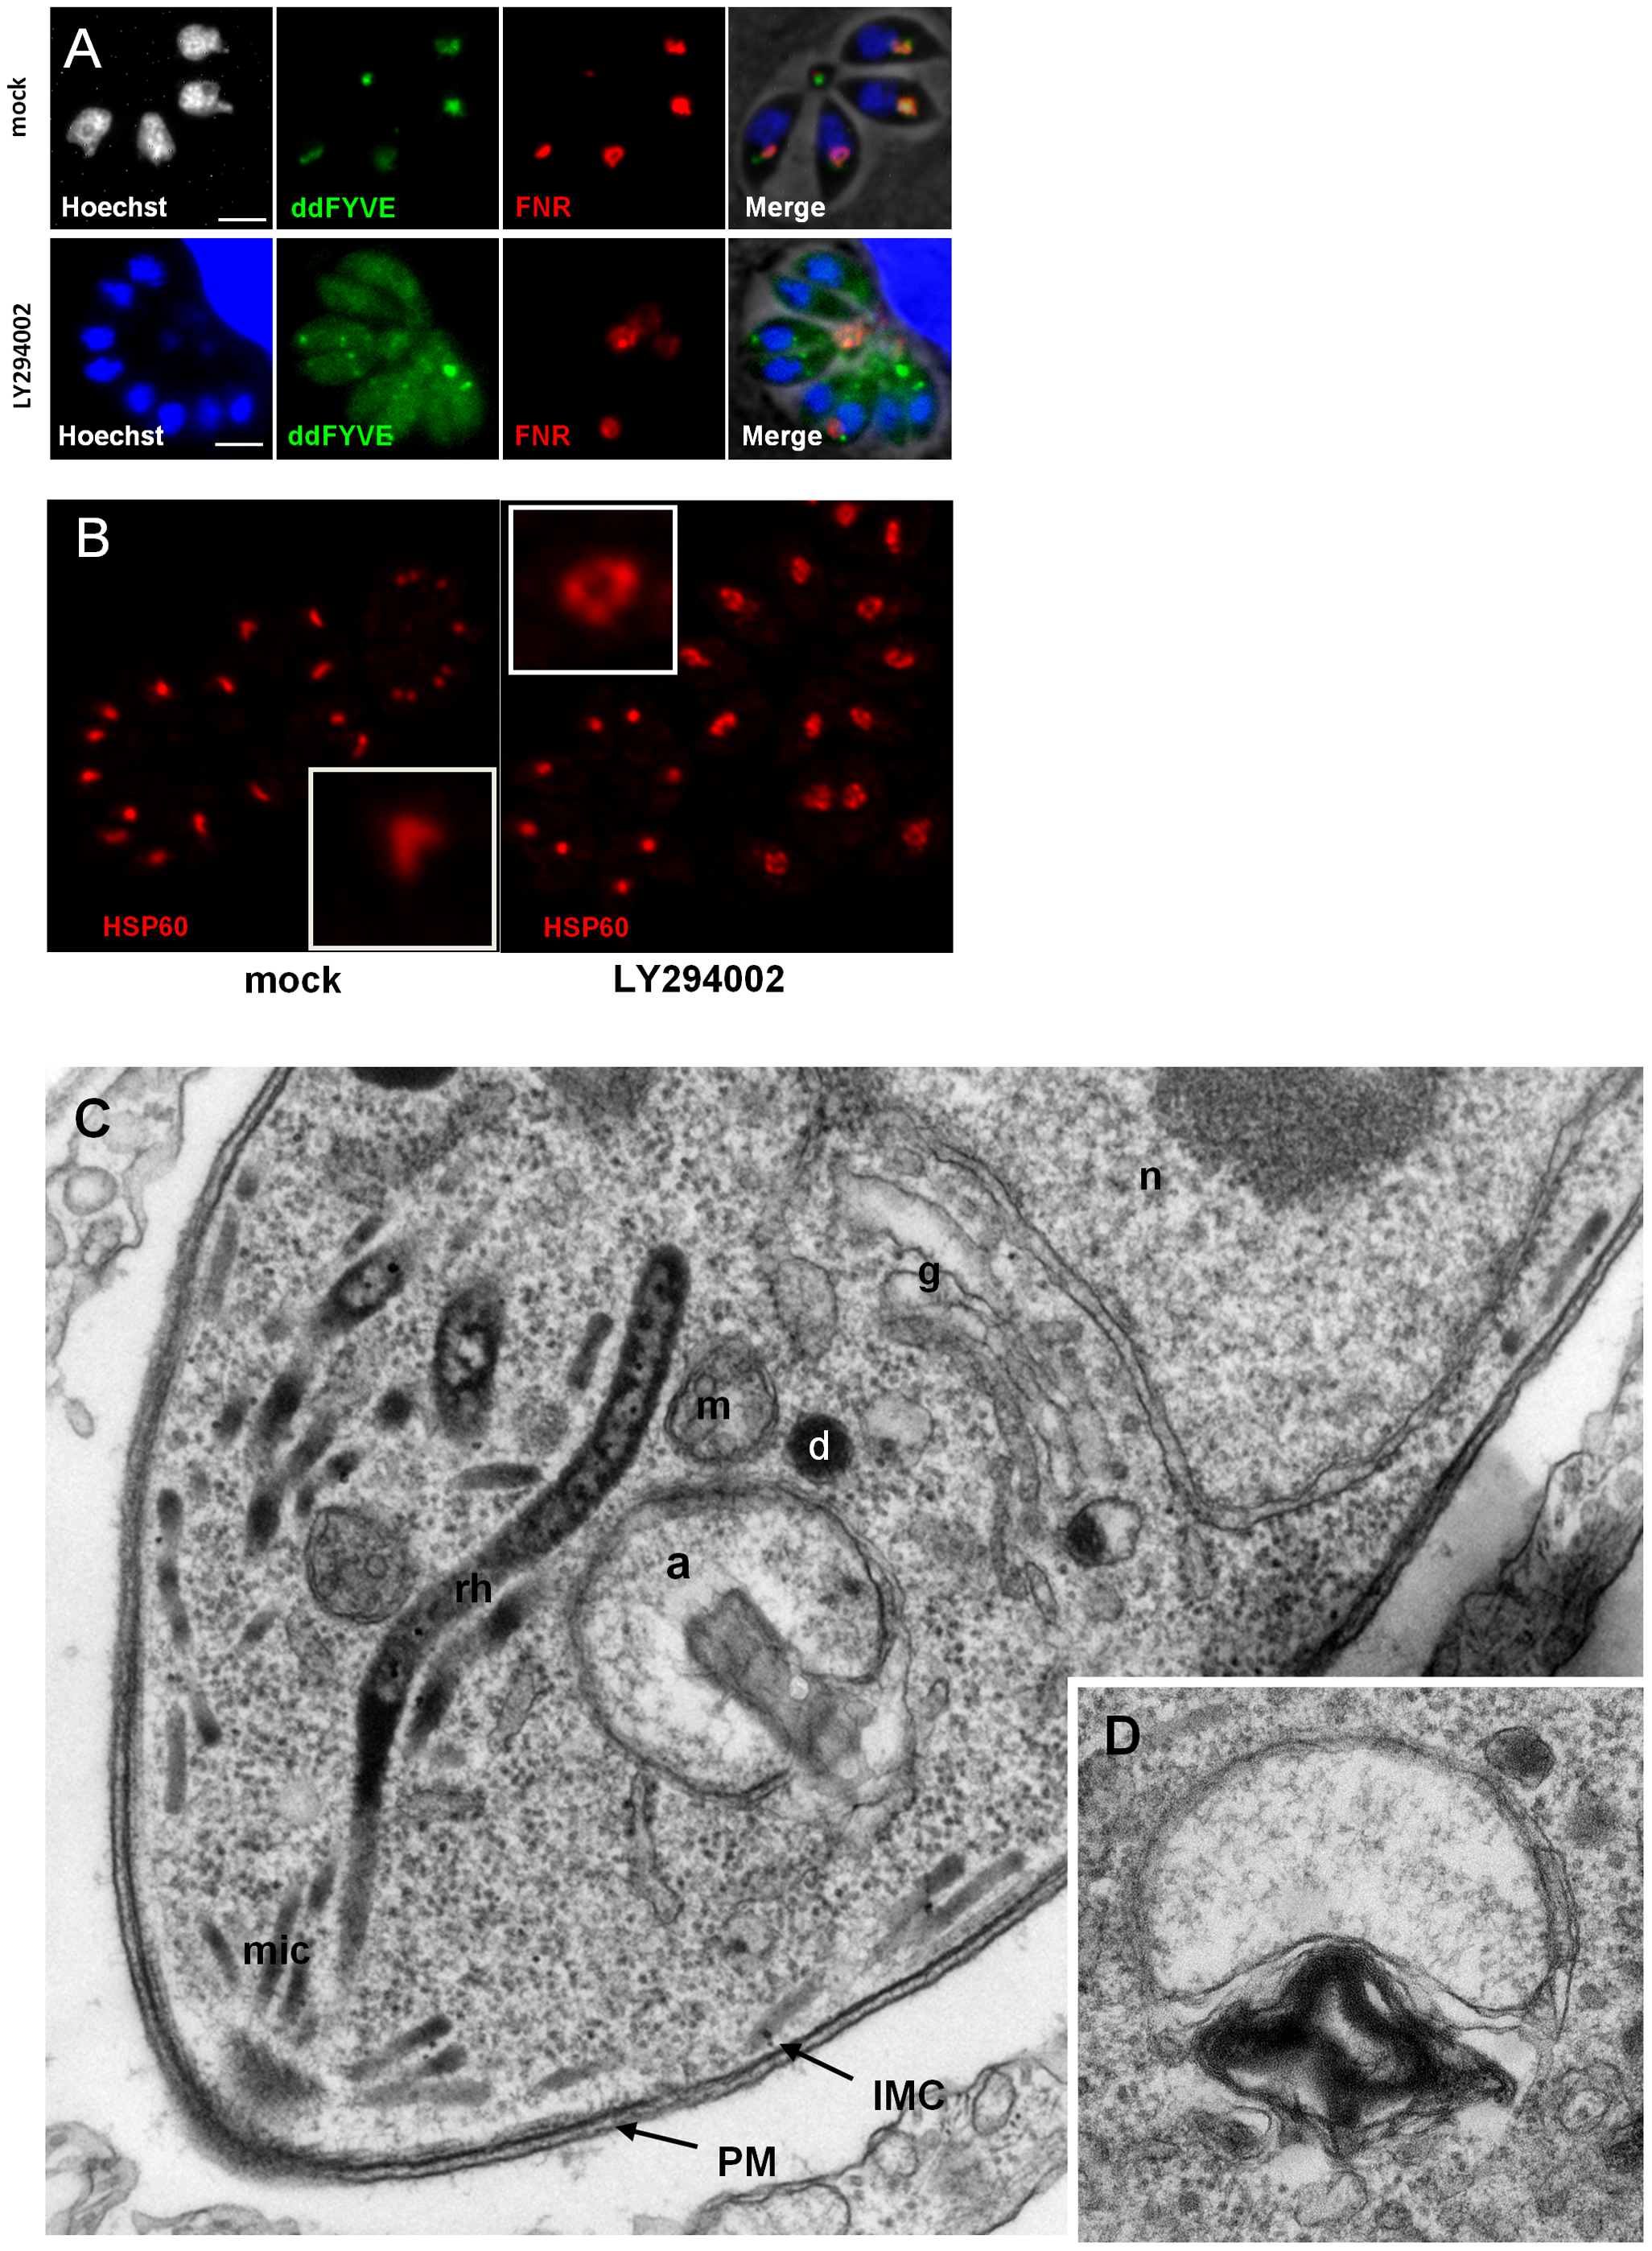 The PI3-kinase inhibitor LY294002 interferes with apicoplast biogenesis.